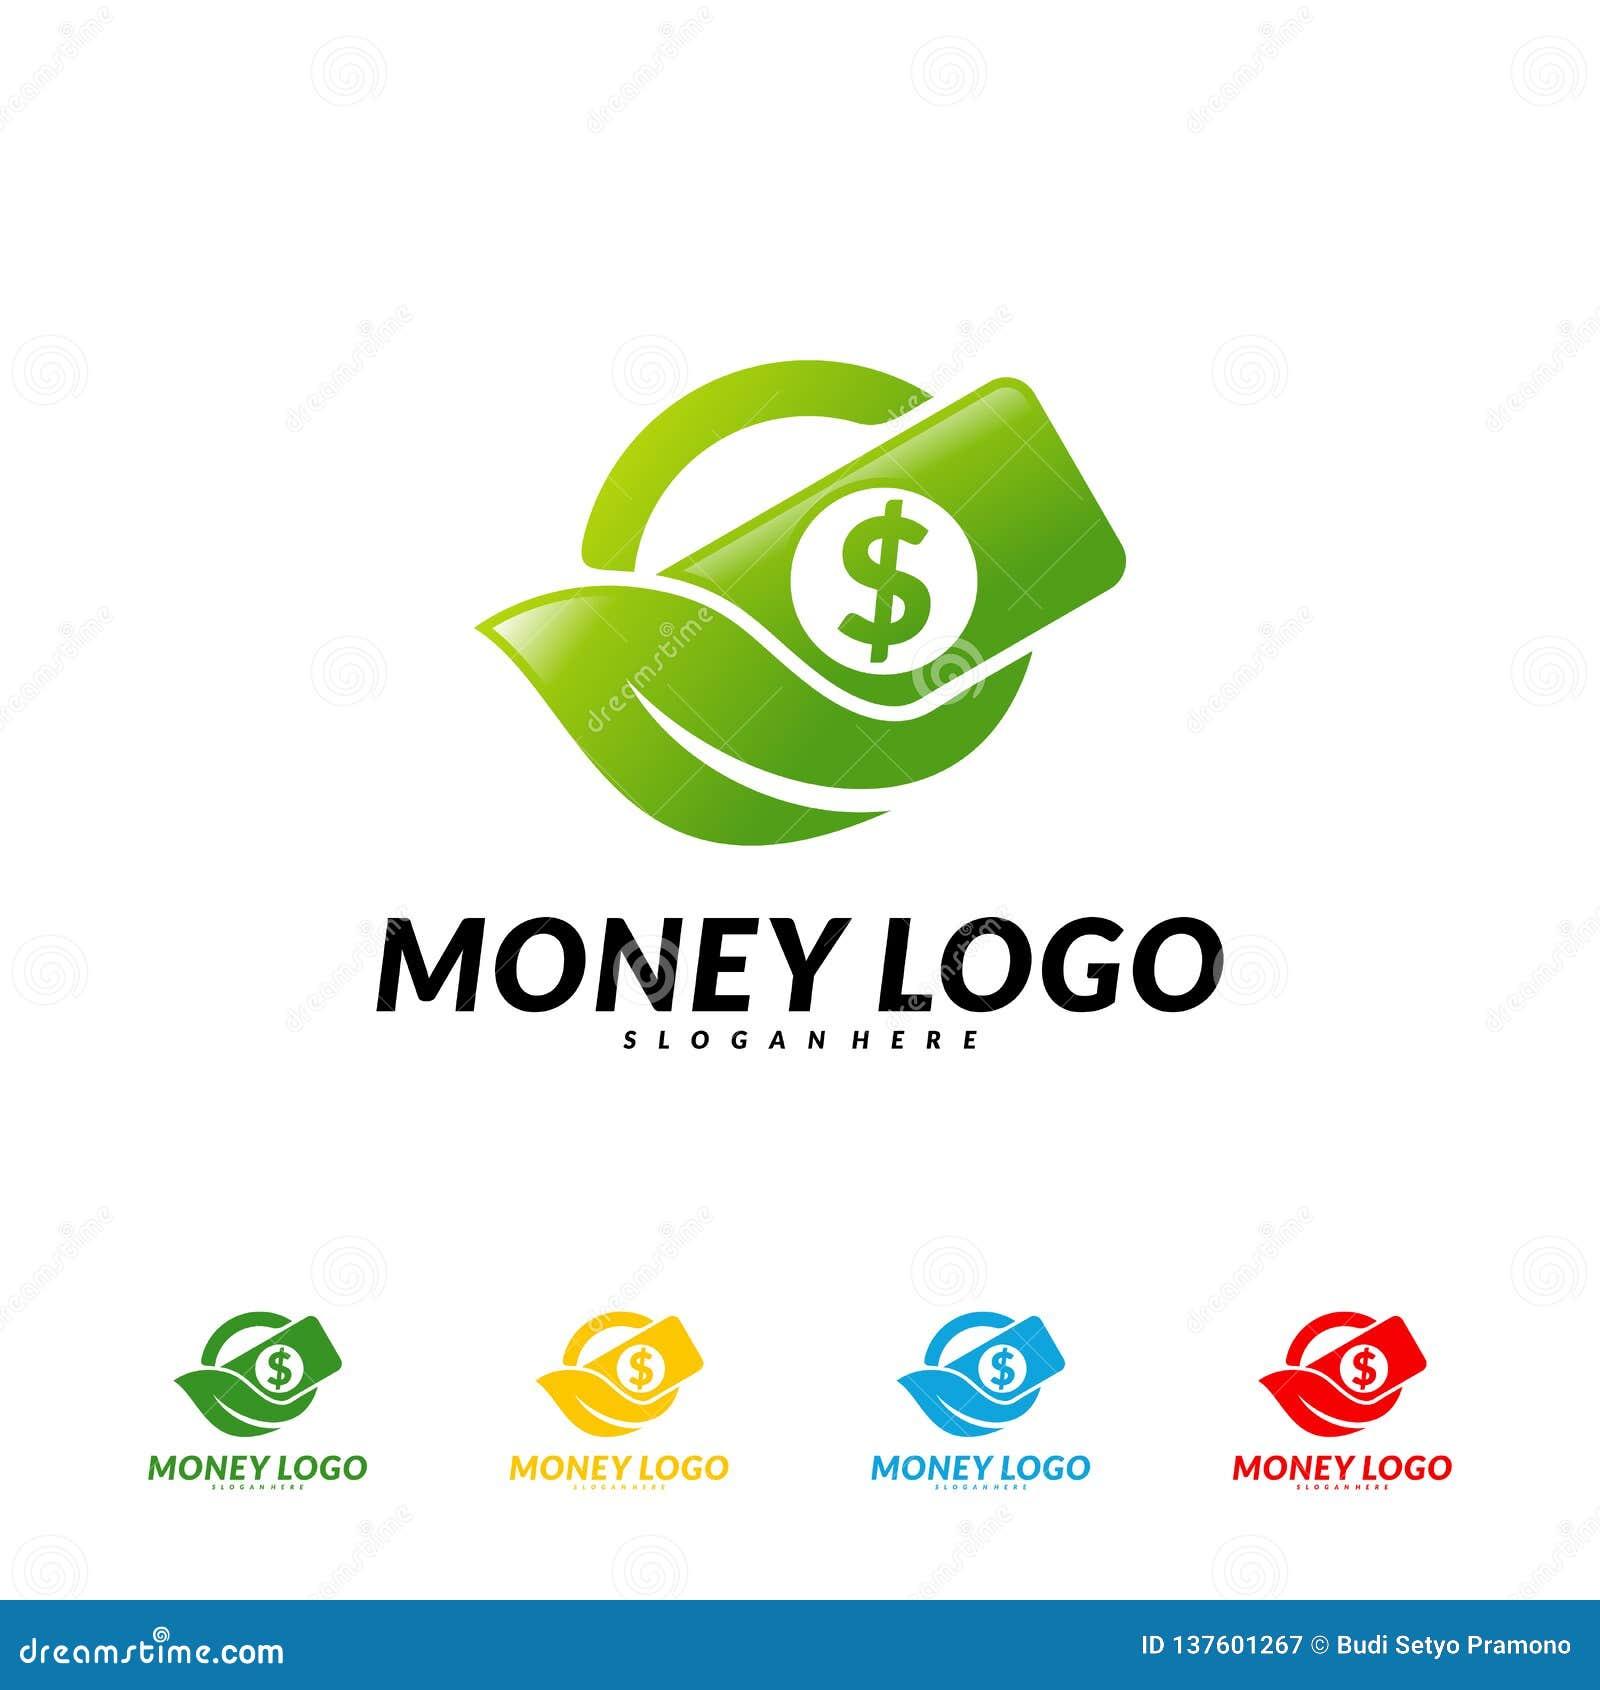 Green Money Logo Design Concept Vector Coin With Leaf Logo Template Stock Vector Illustration Of Clover Dollar 137601267